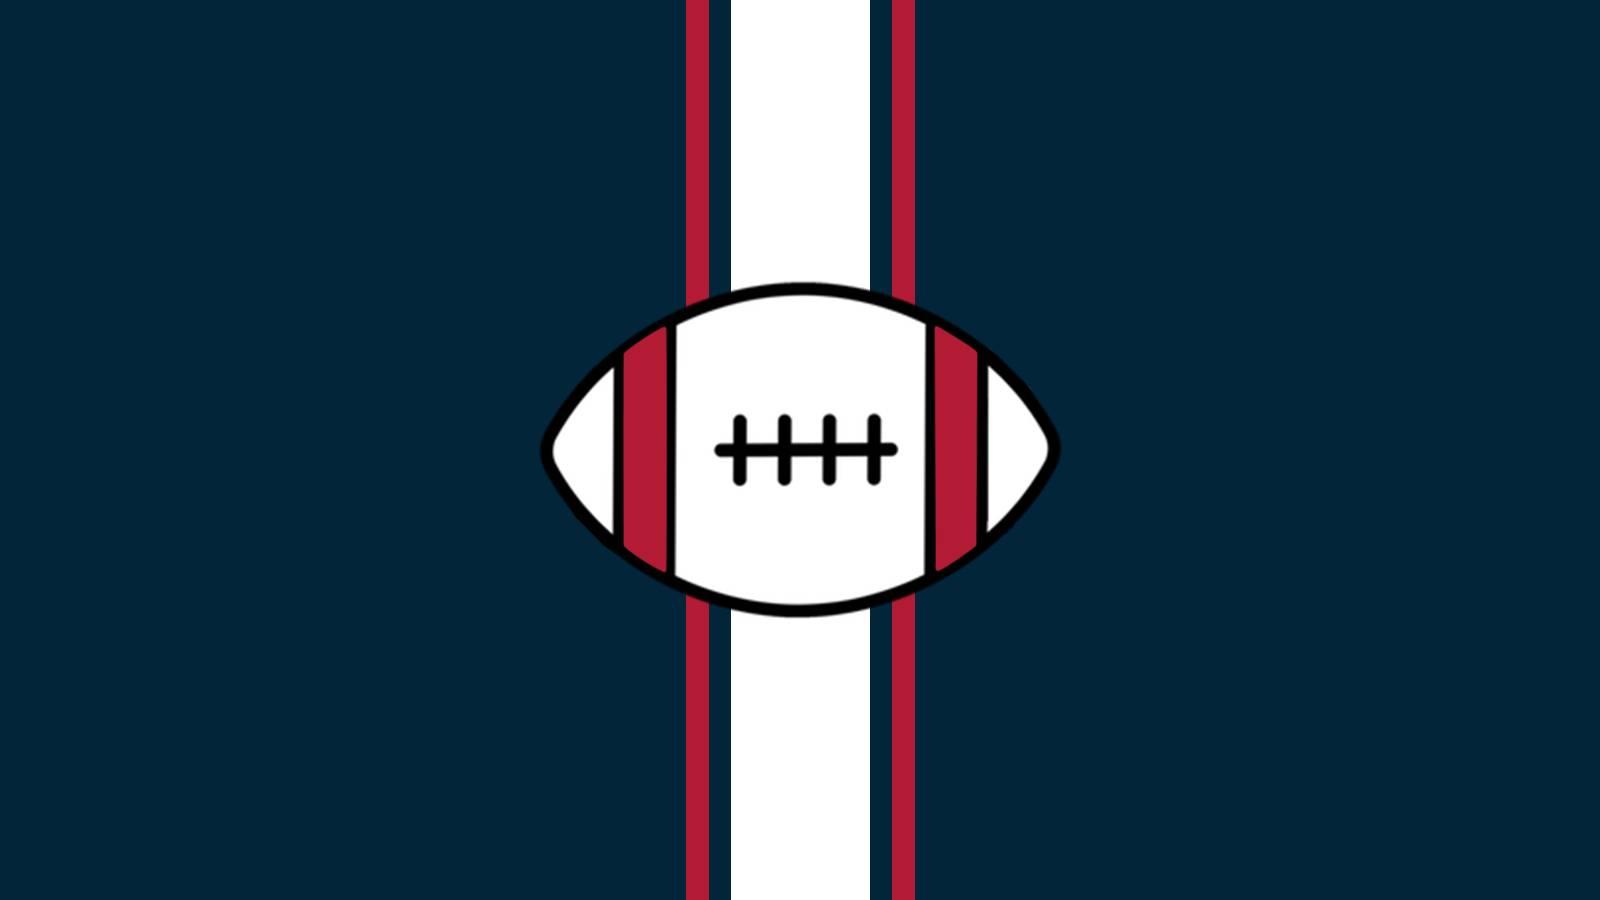 NFL Preseason - Seattle Seahawks at Houston Texans